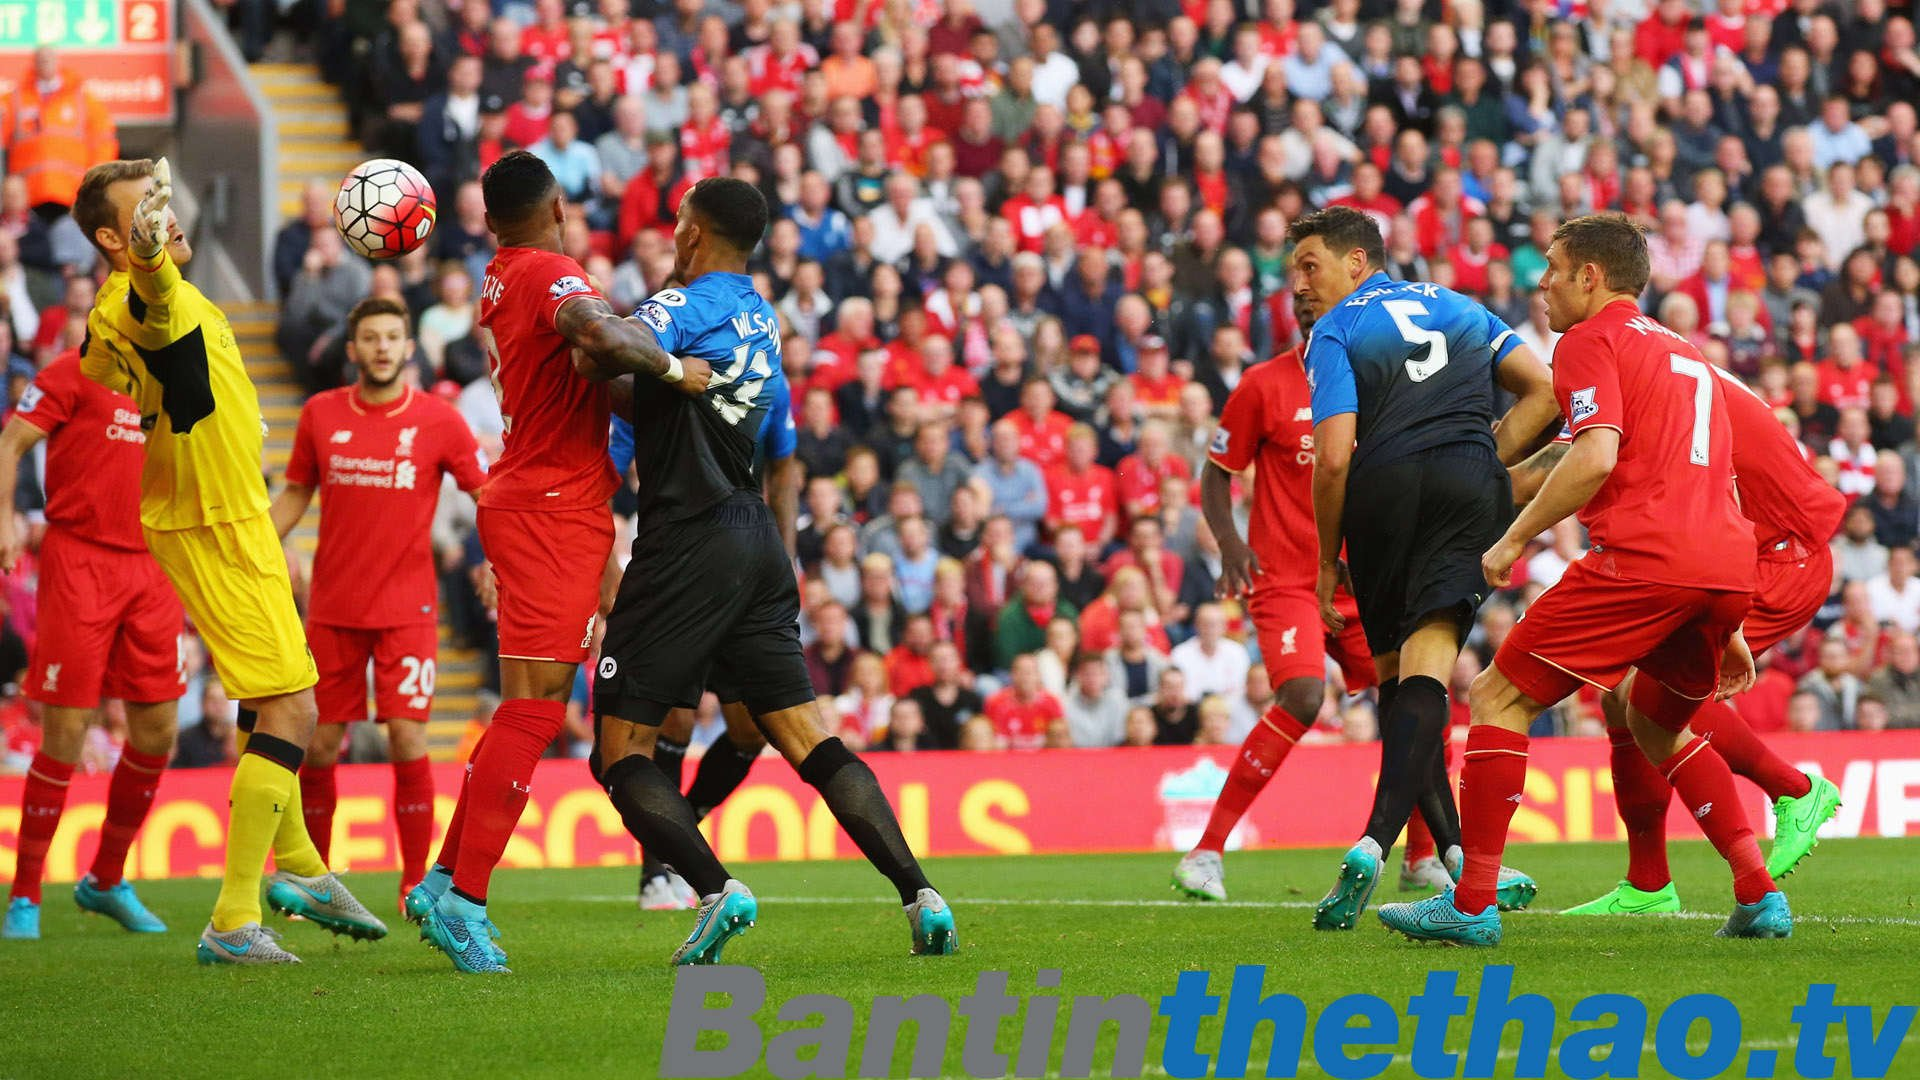 Liverpool vs Bournemouth tối nay 17/12/2017 Ngoại Hạng Anh